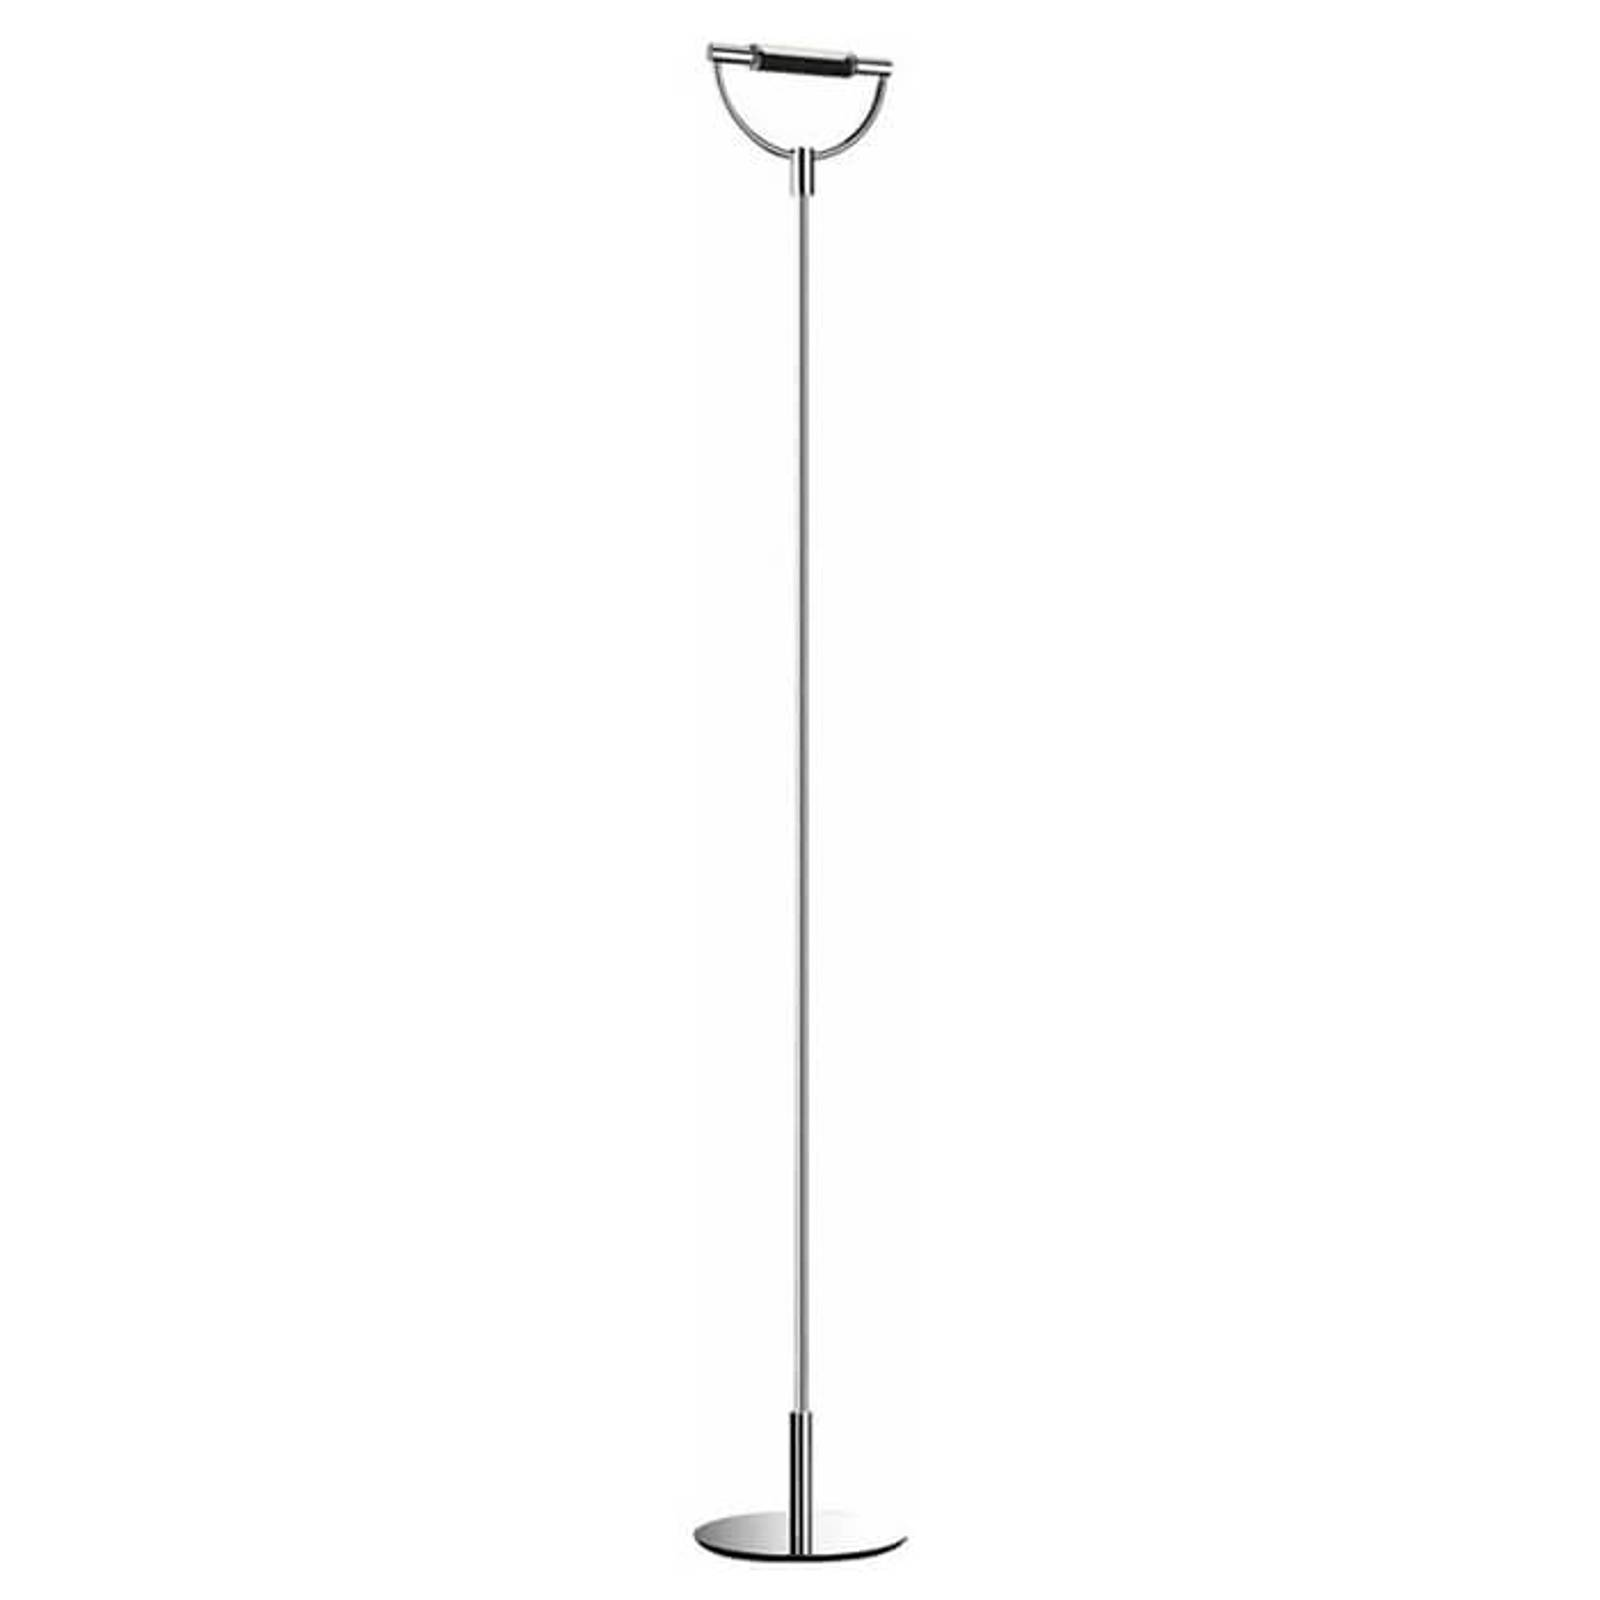 Cini&Nils Gradi - LED-lattiavalaisin, kromi jalka